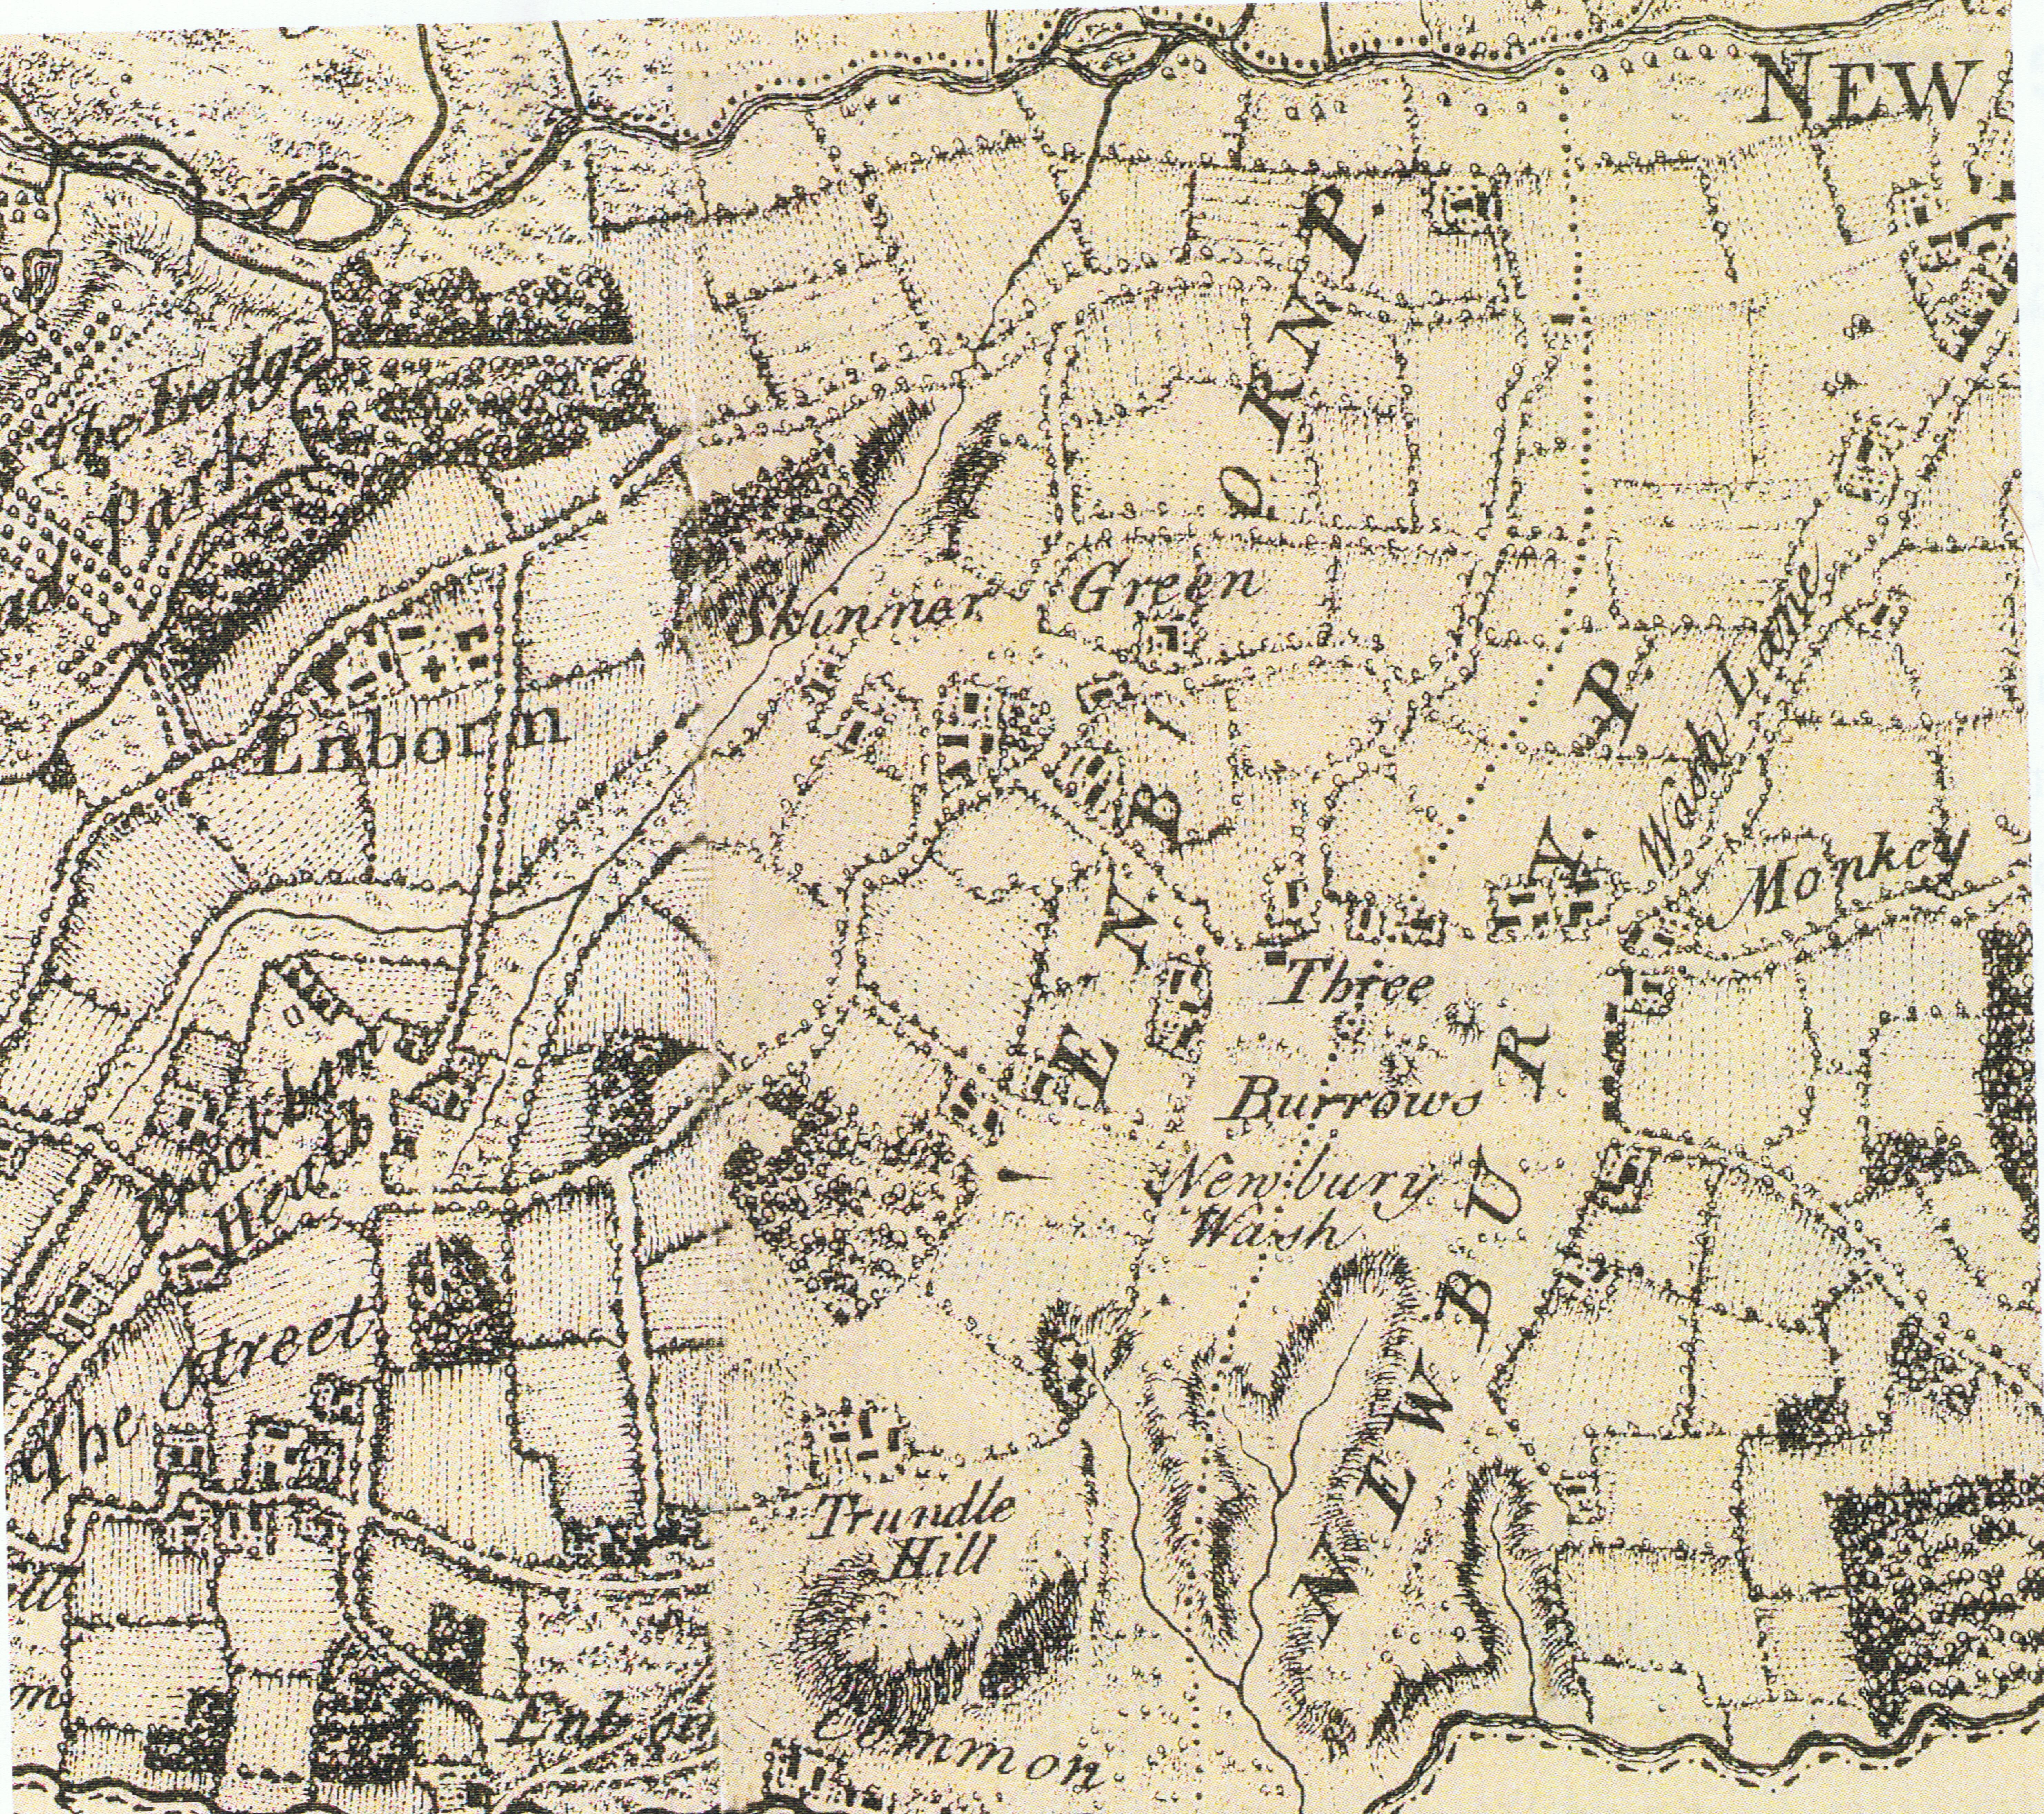 FileSandleford Newbury Wash Enborne Wash And East Enborne - Wash map